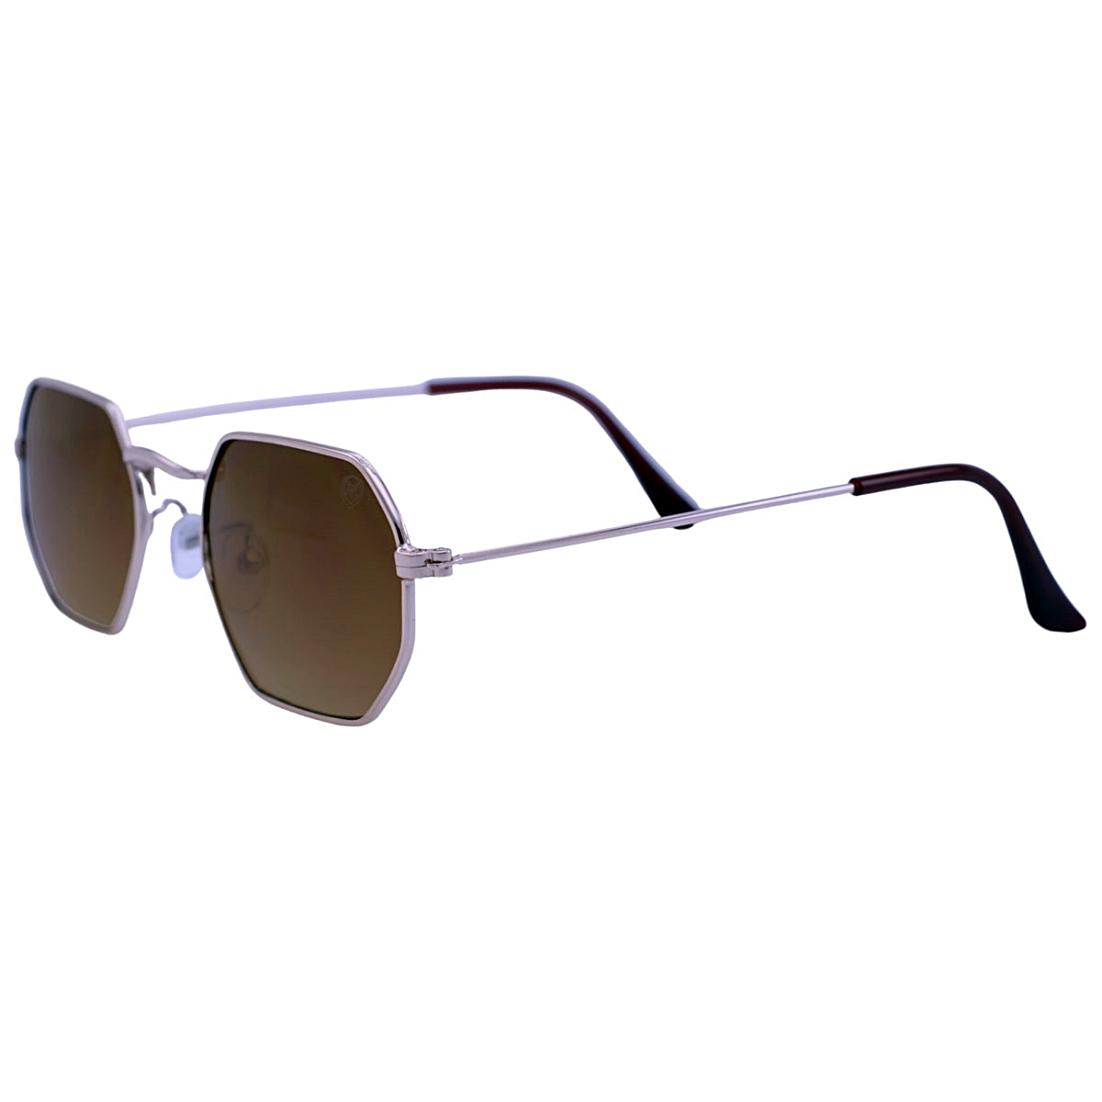 Óculos De Sol Mackage Unissex Metal Hexagonal Mini - Dourado